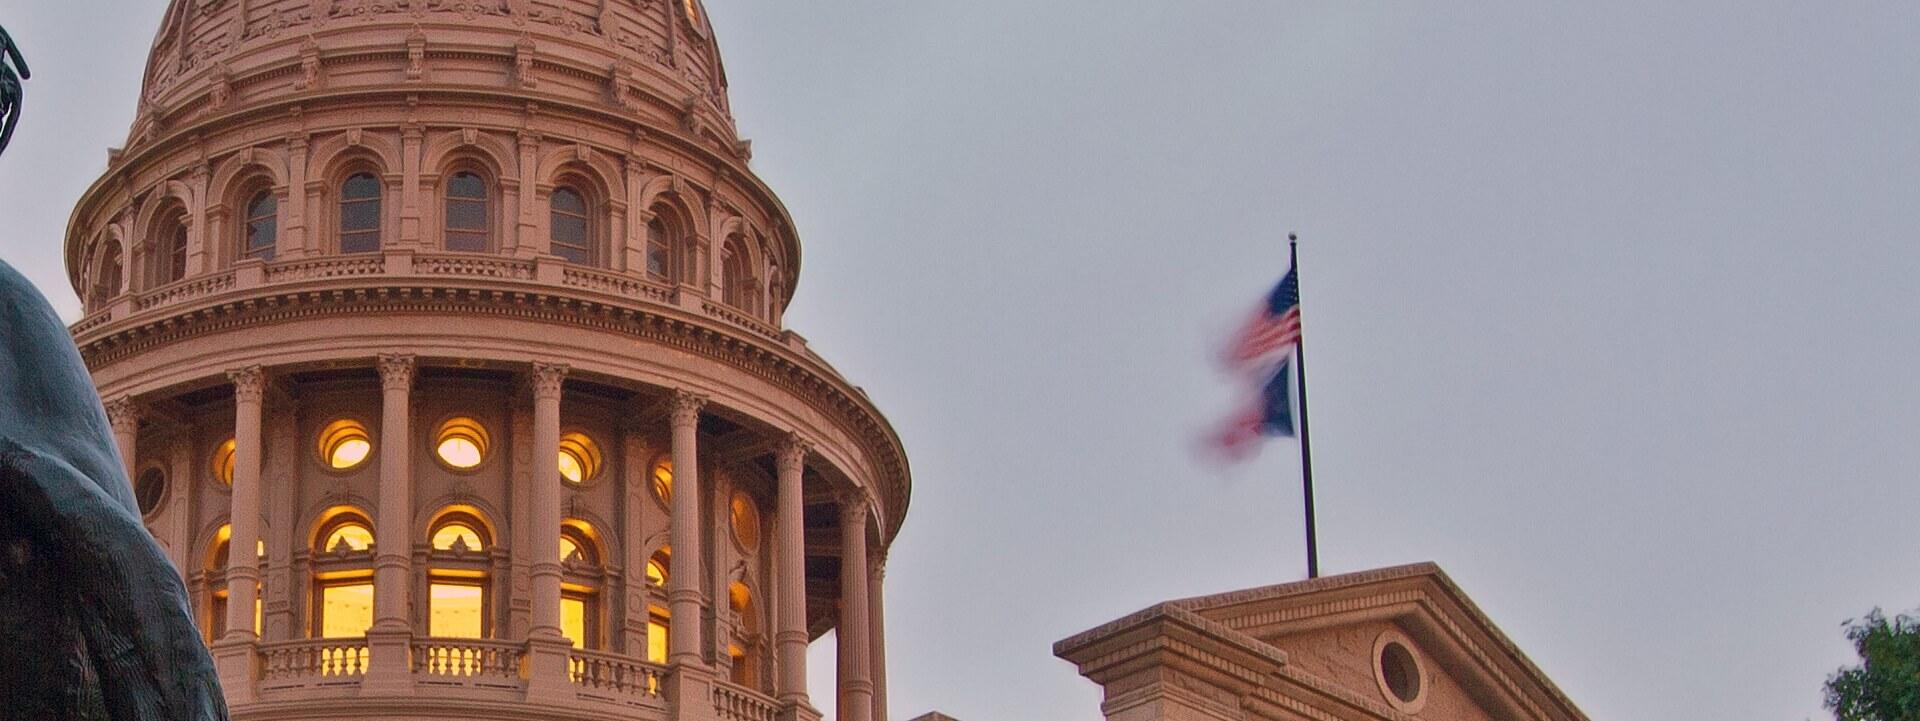 Emergency Locksmith Services in Austin, TX